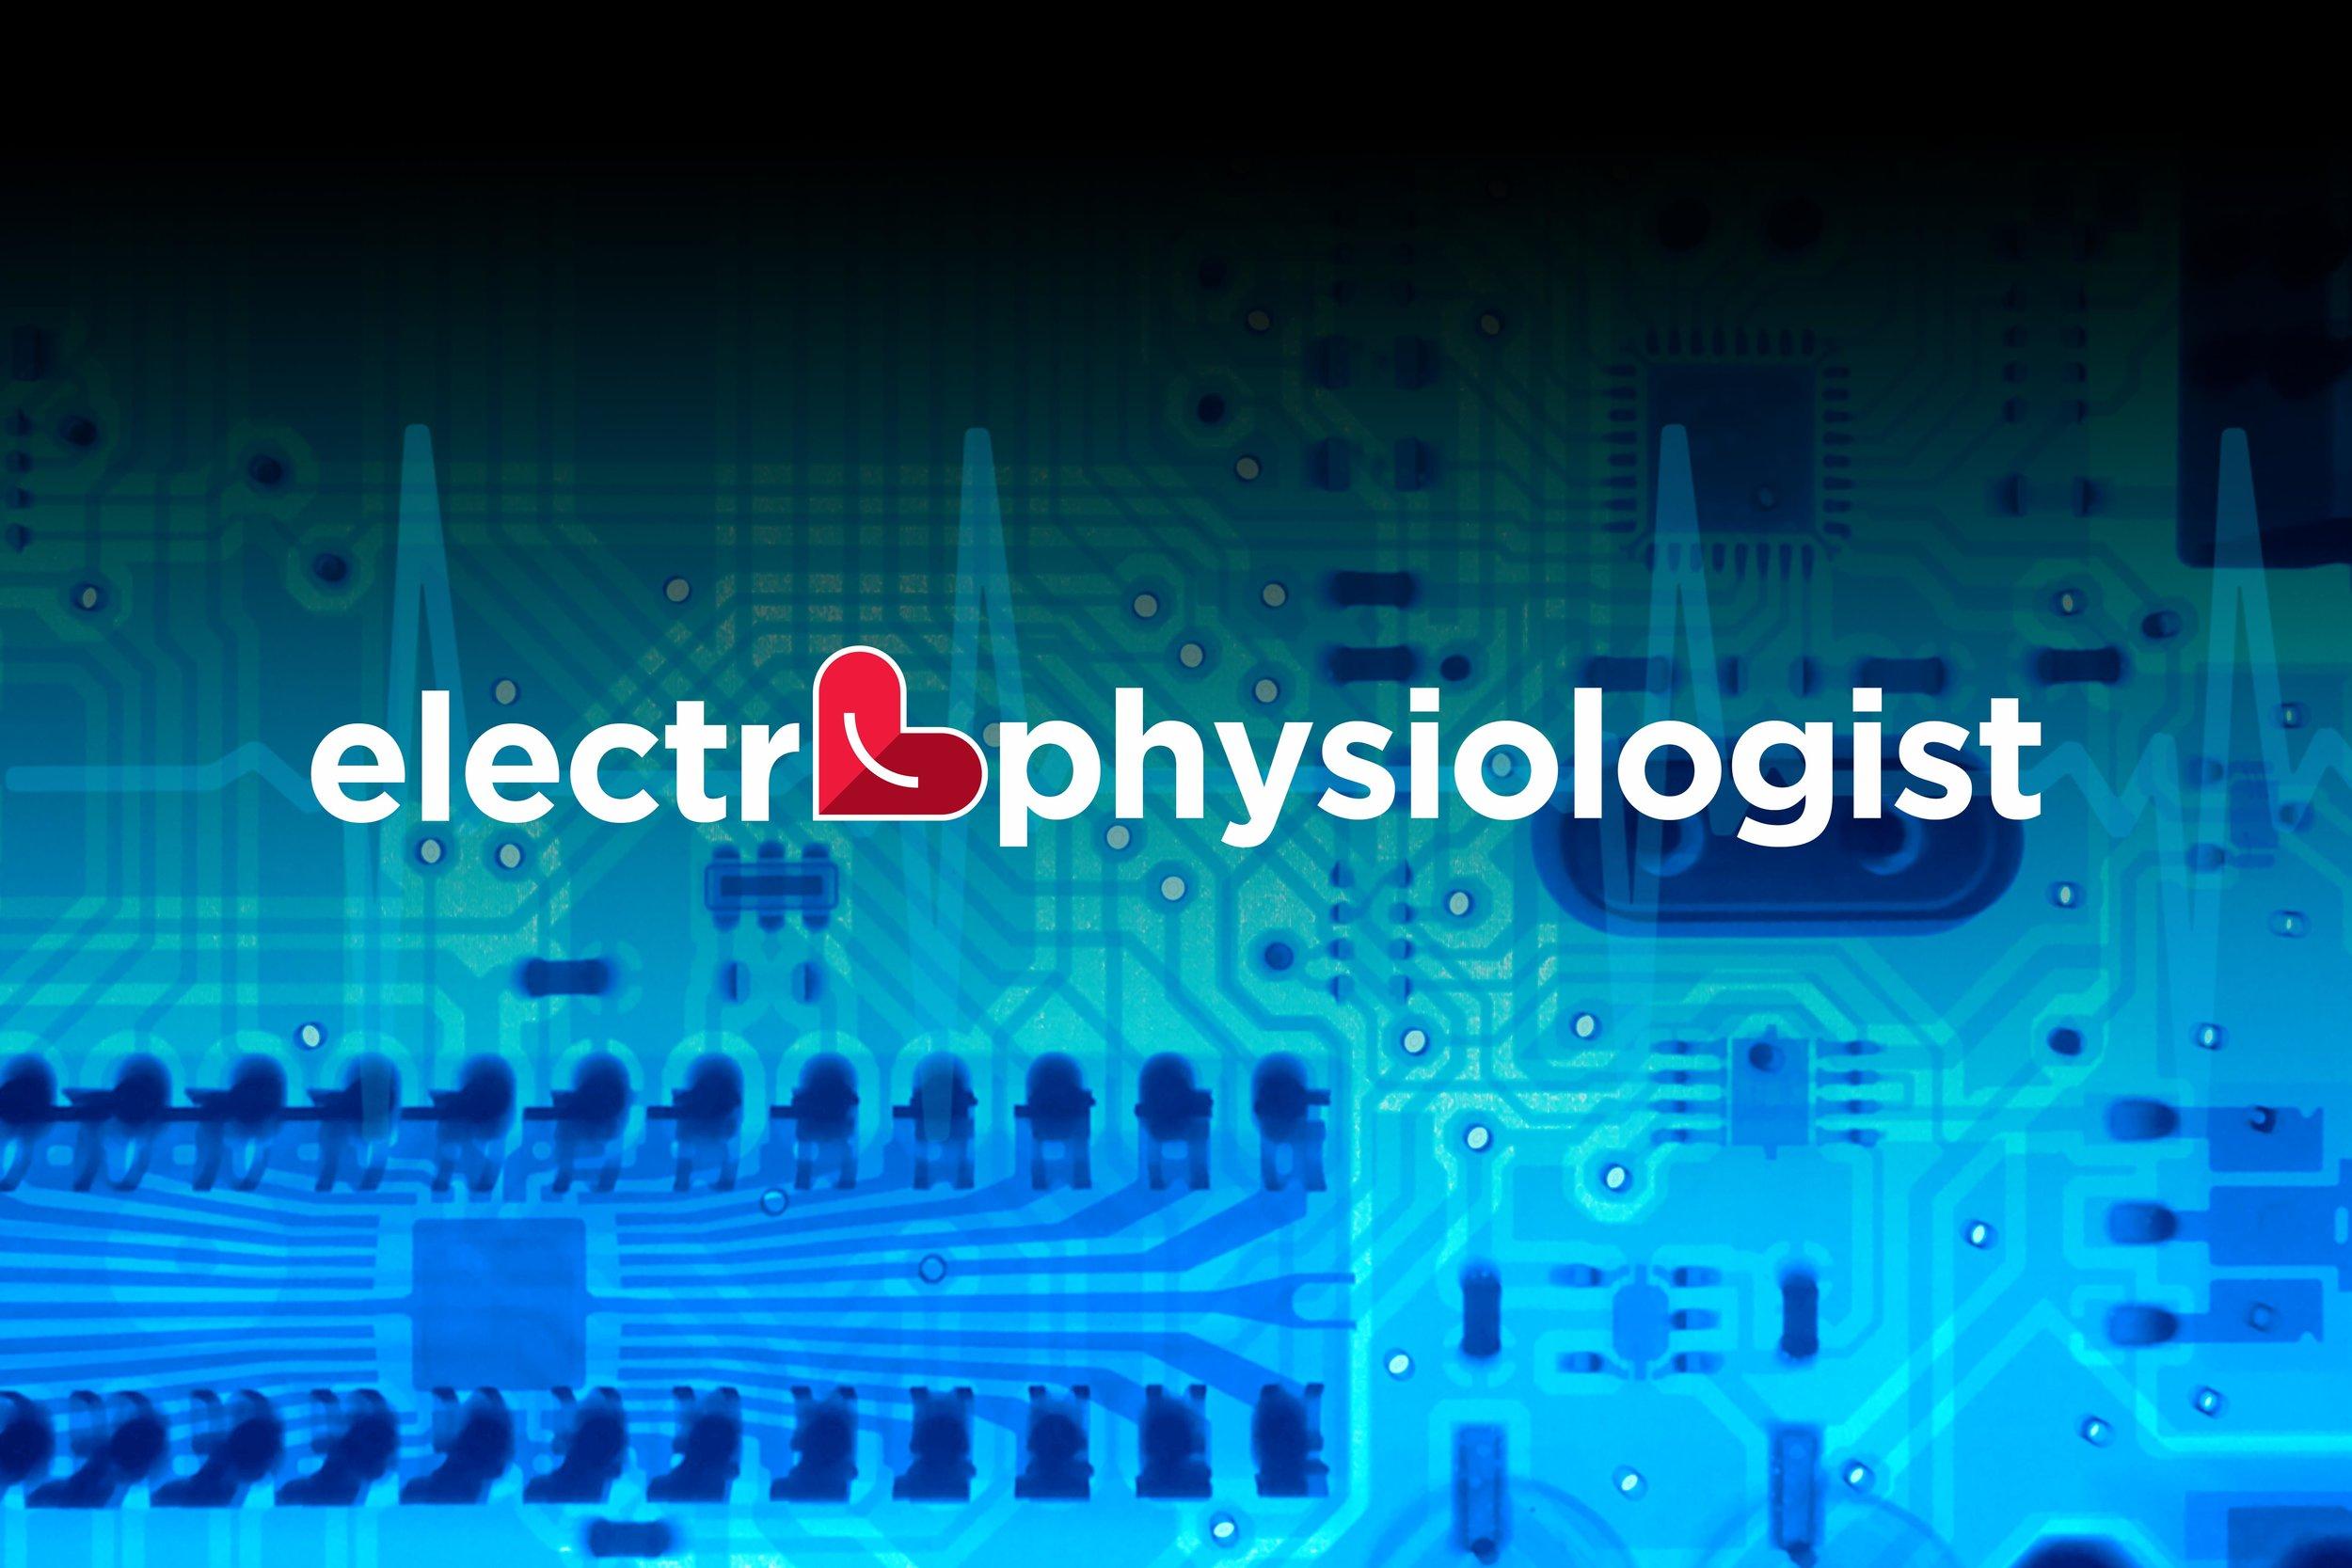 electroph blue.jpg